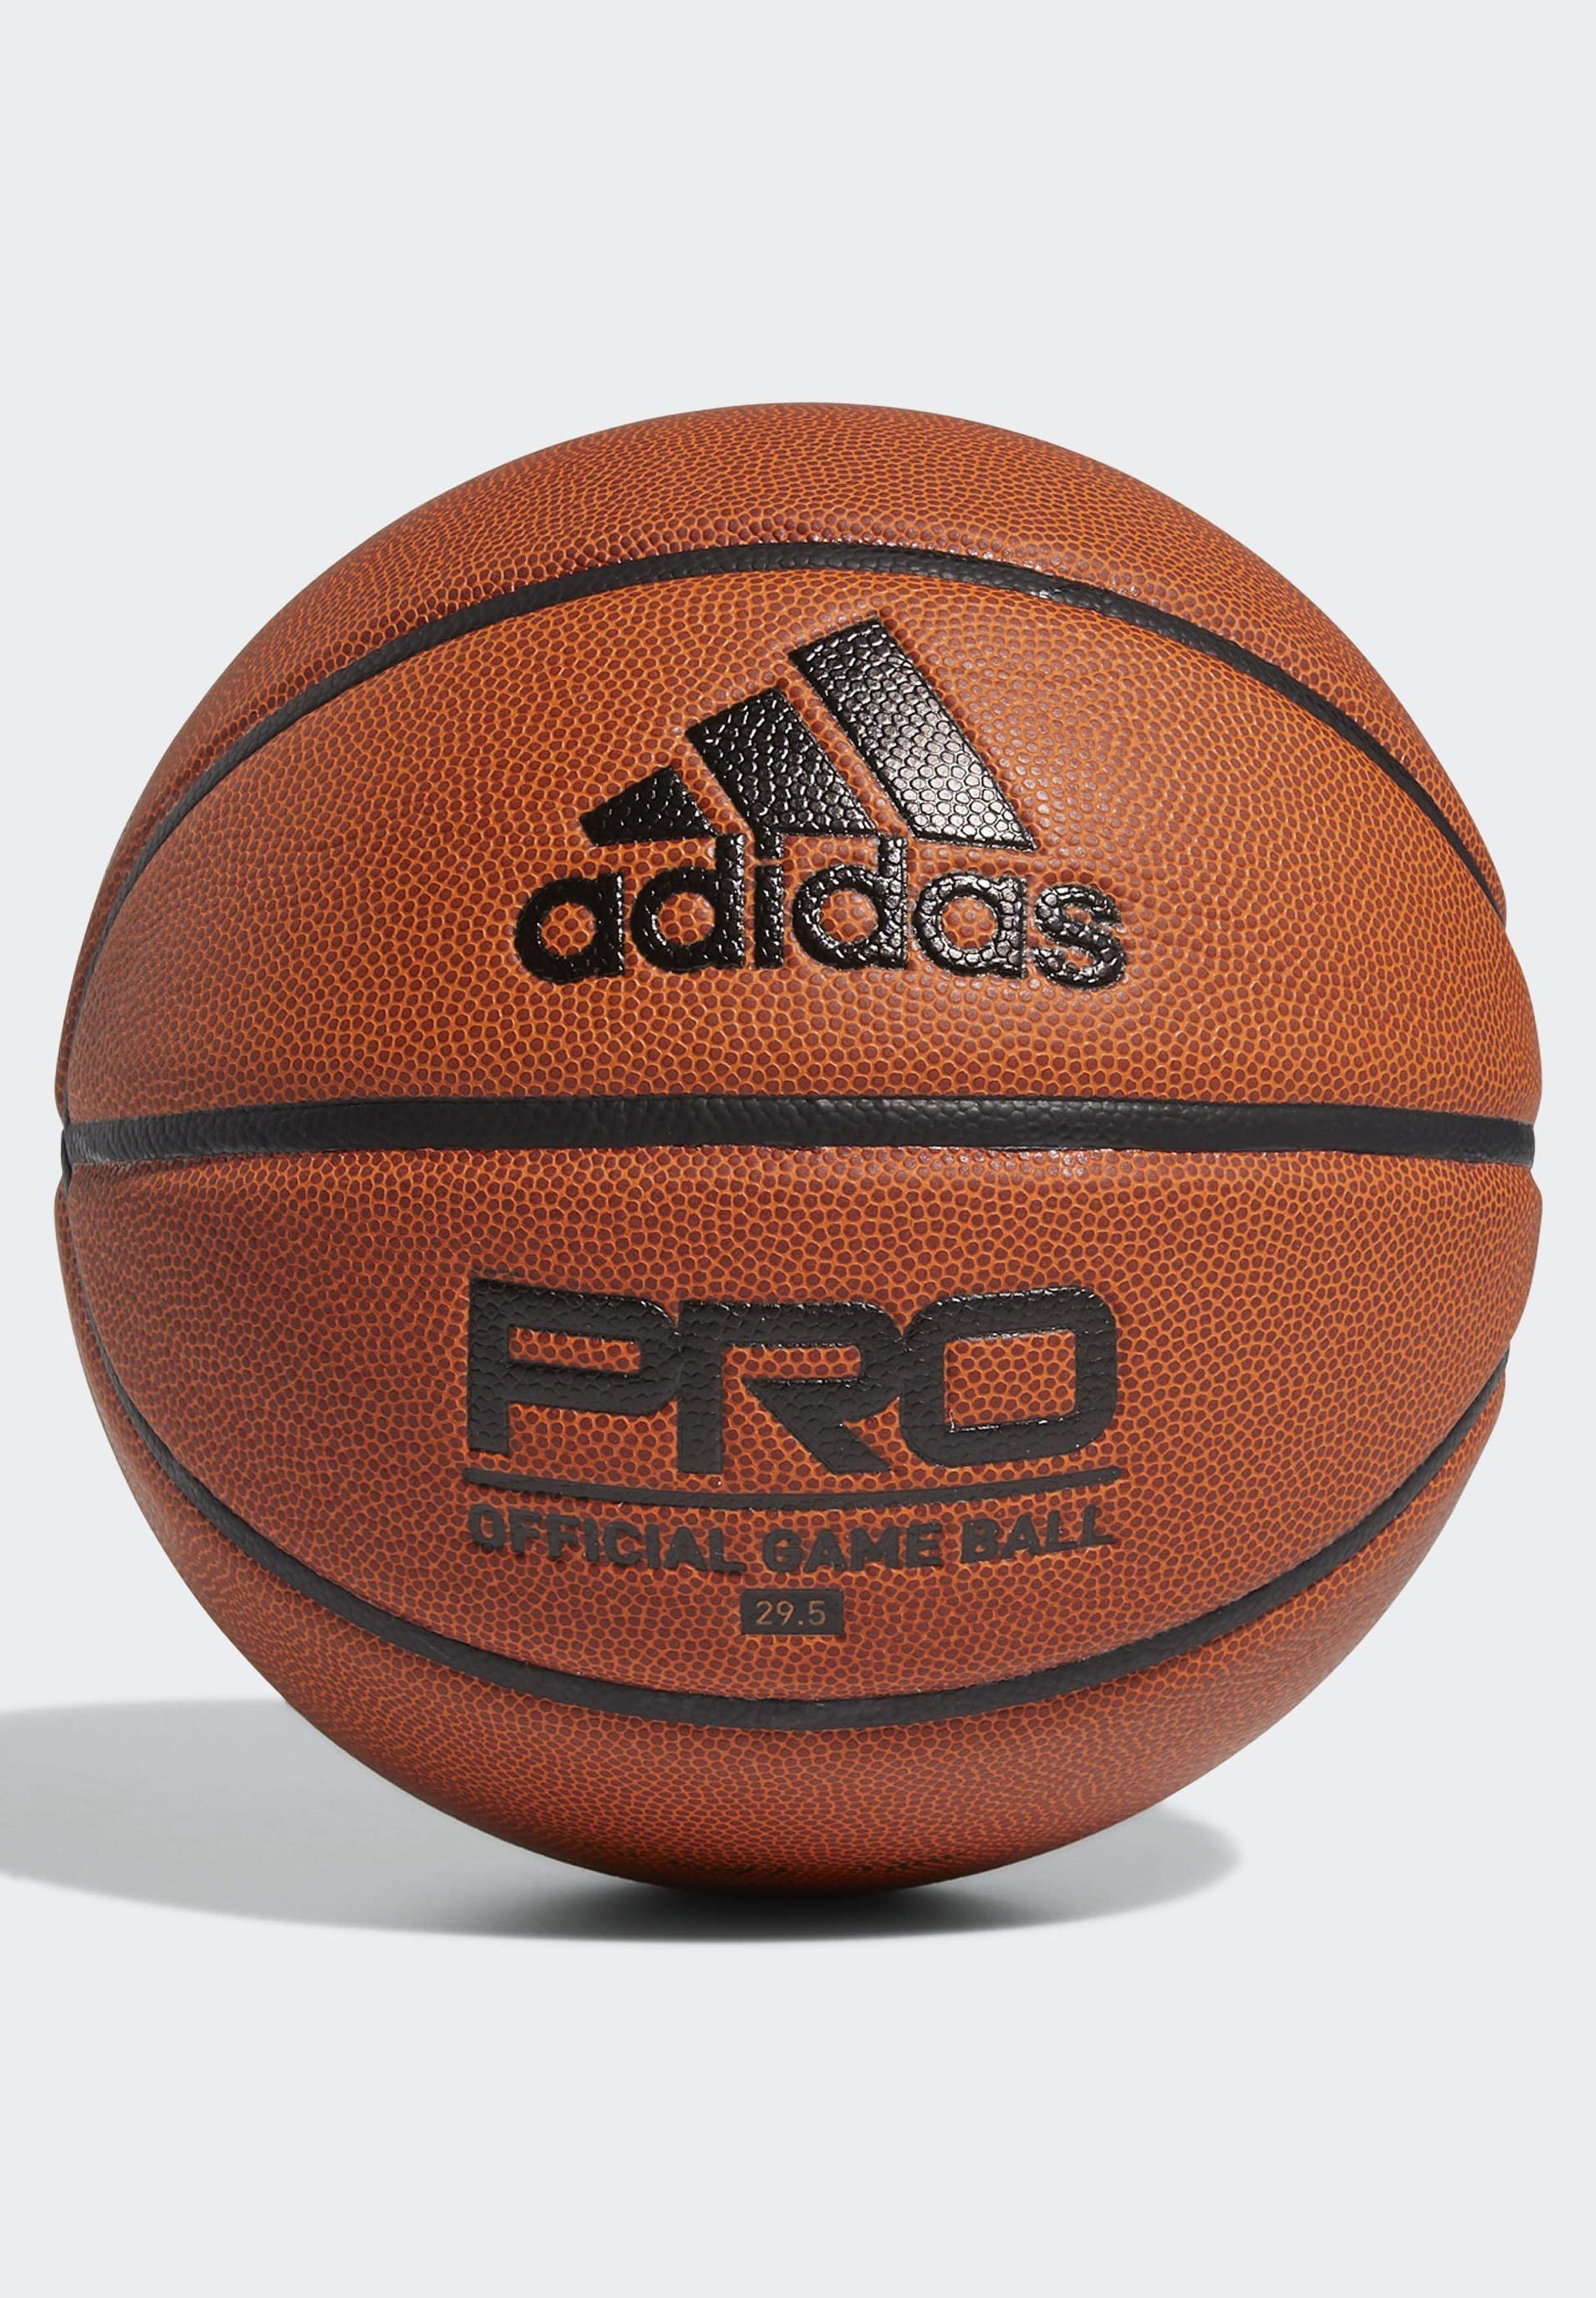 Femme BALLON PRO 2.0 OFFICIAL GAME - Equipement de basketball